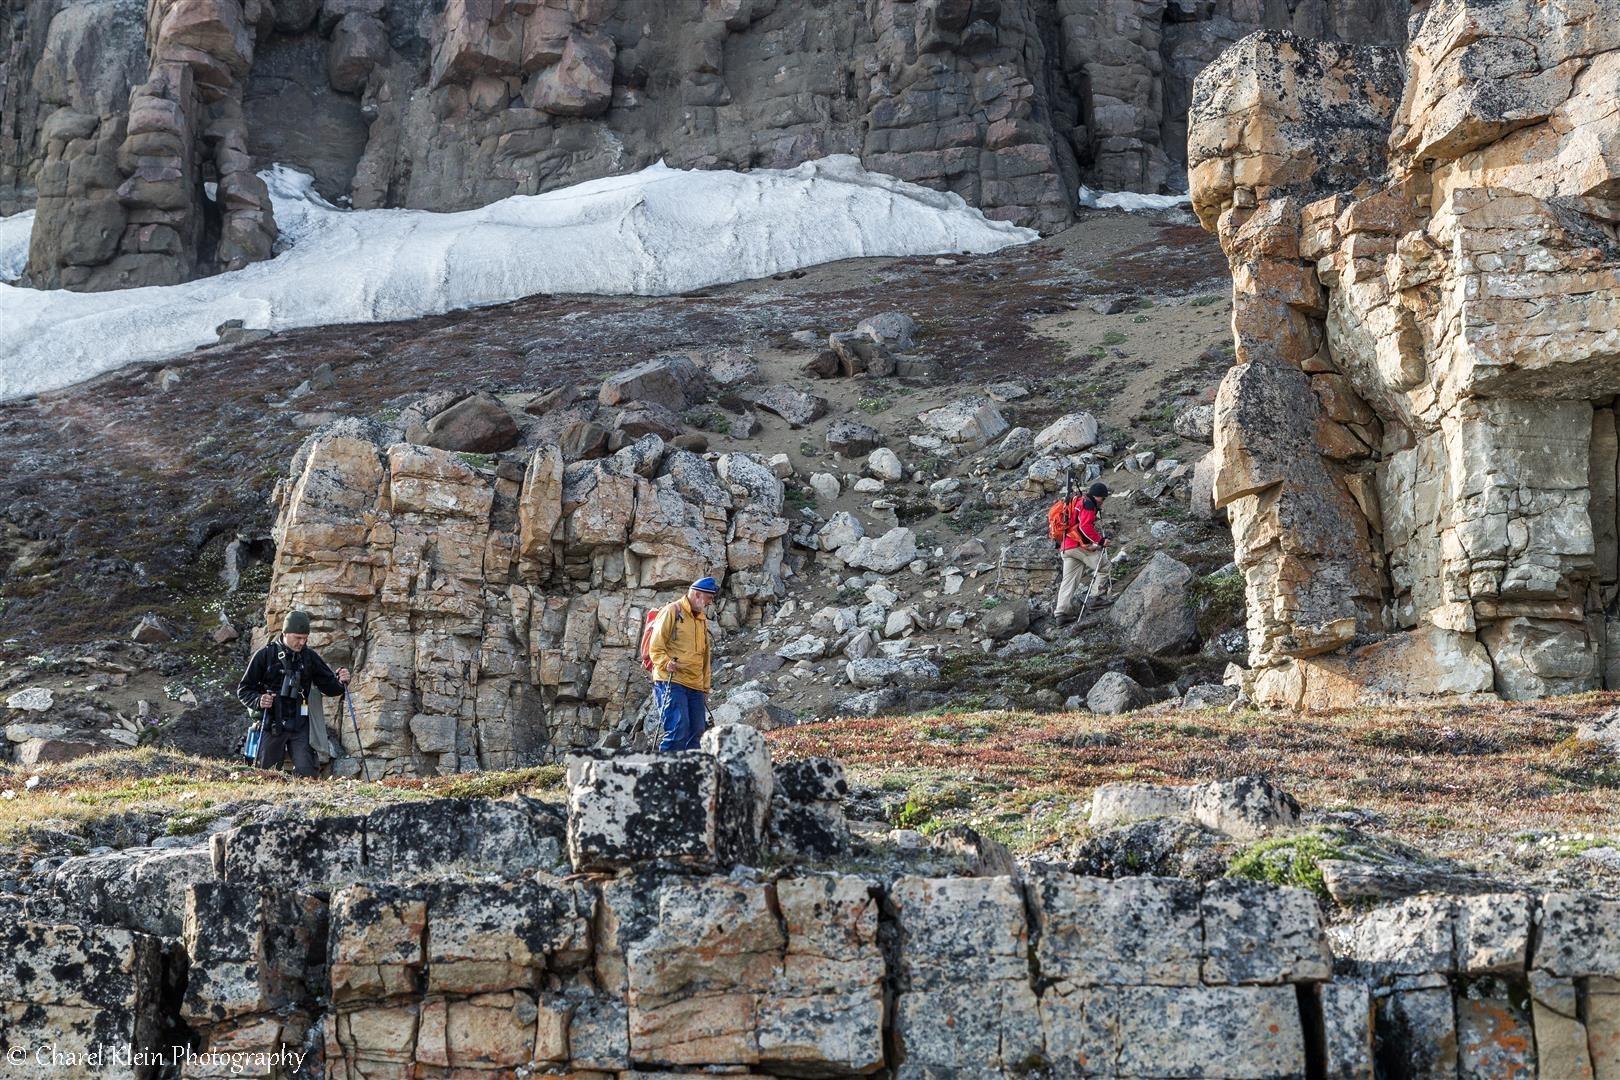 Exploring the Kong Oscar Fjord